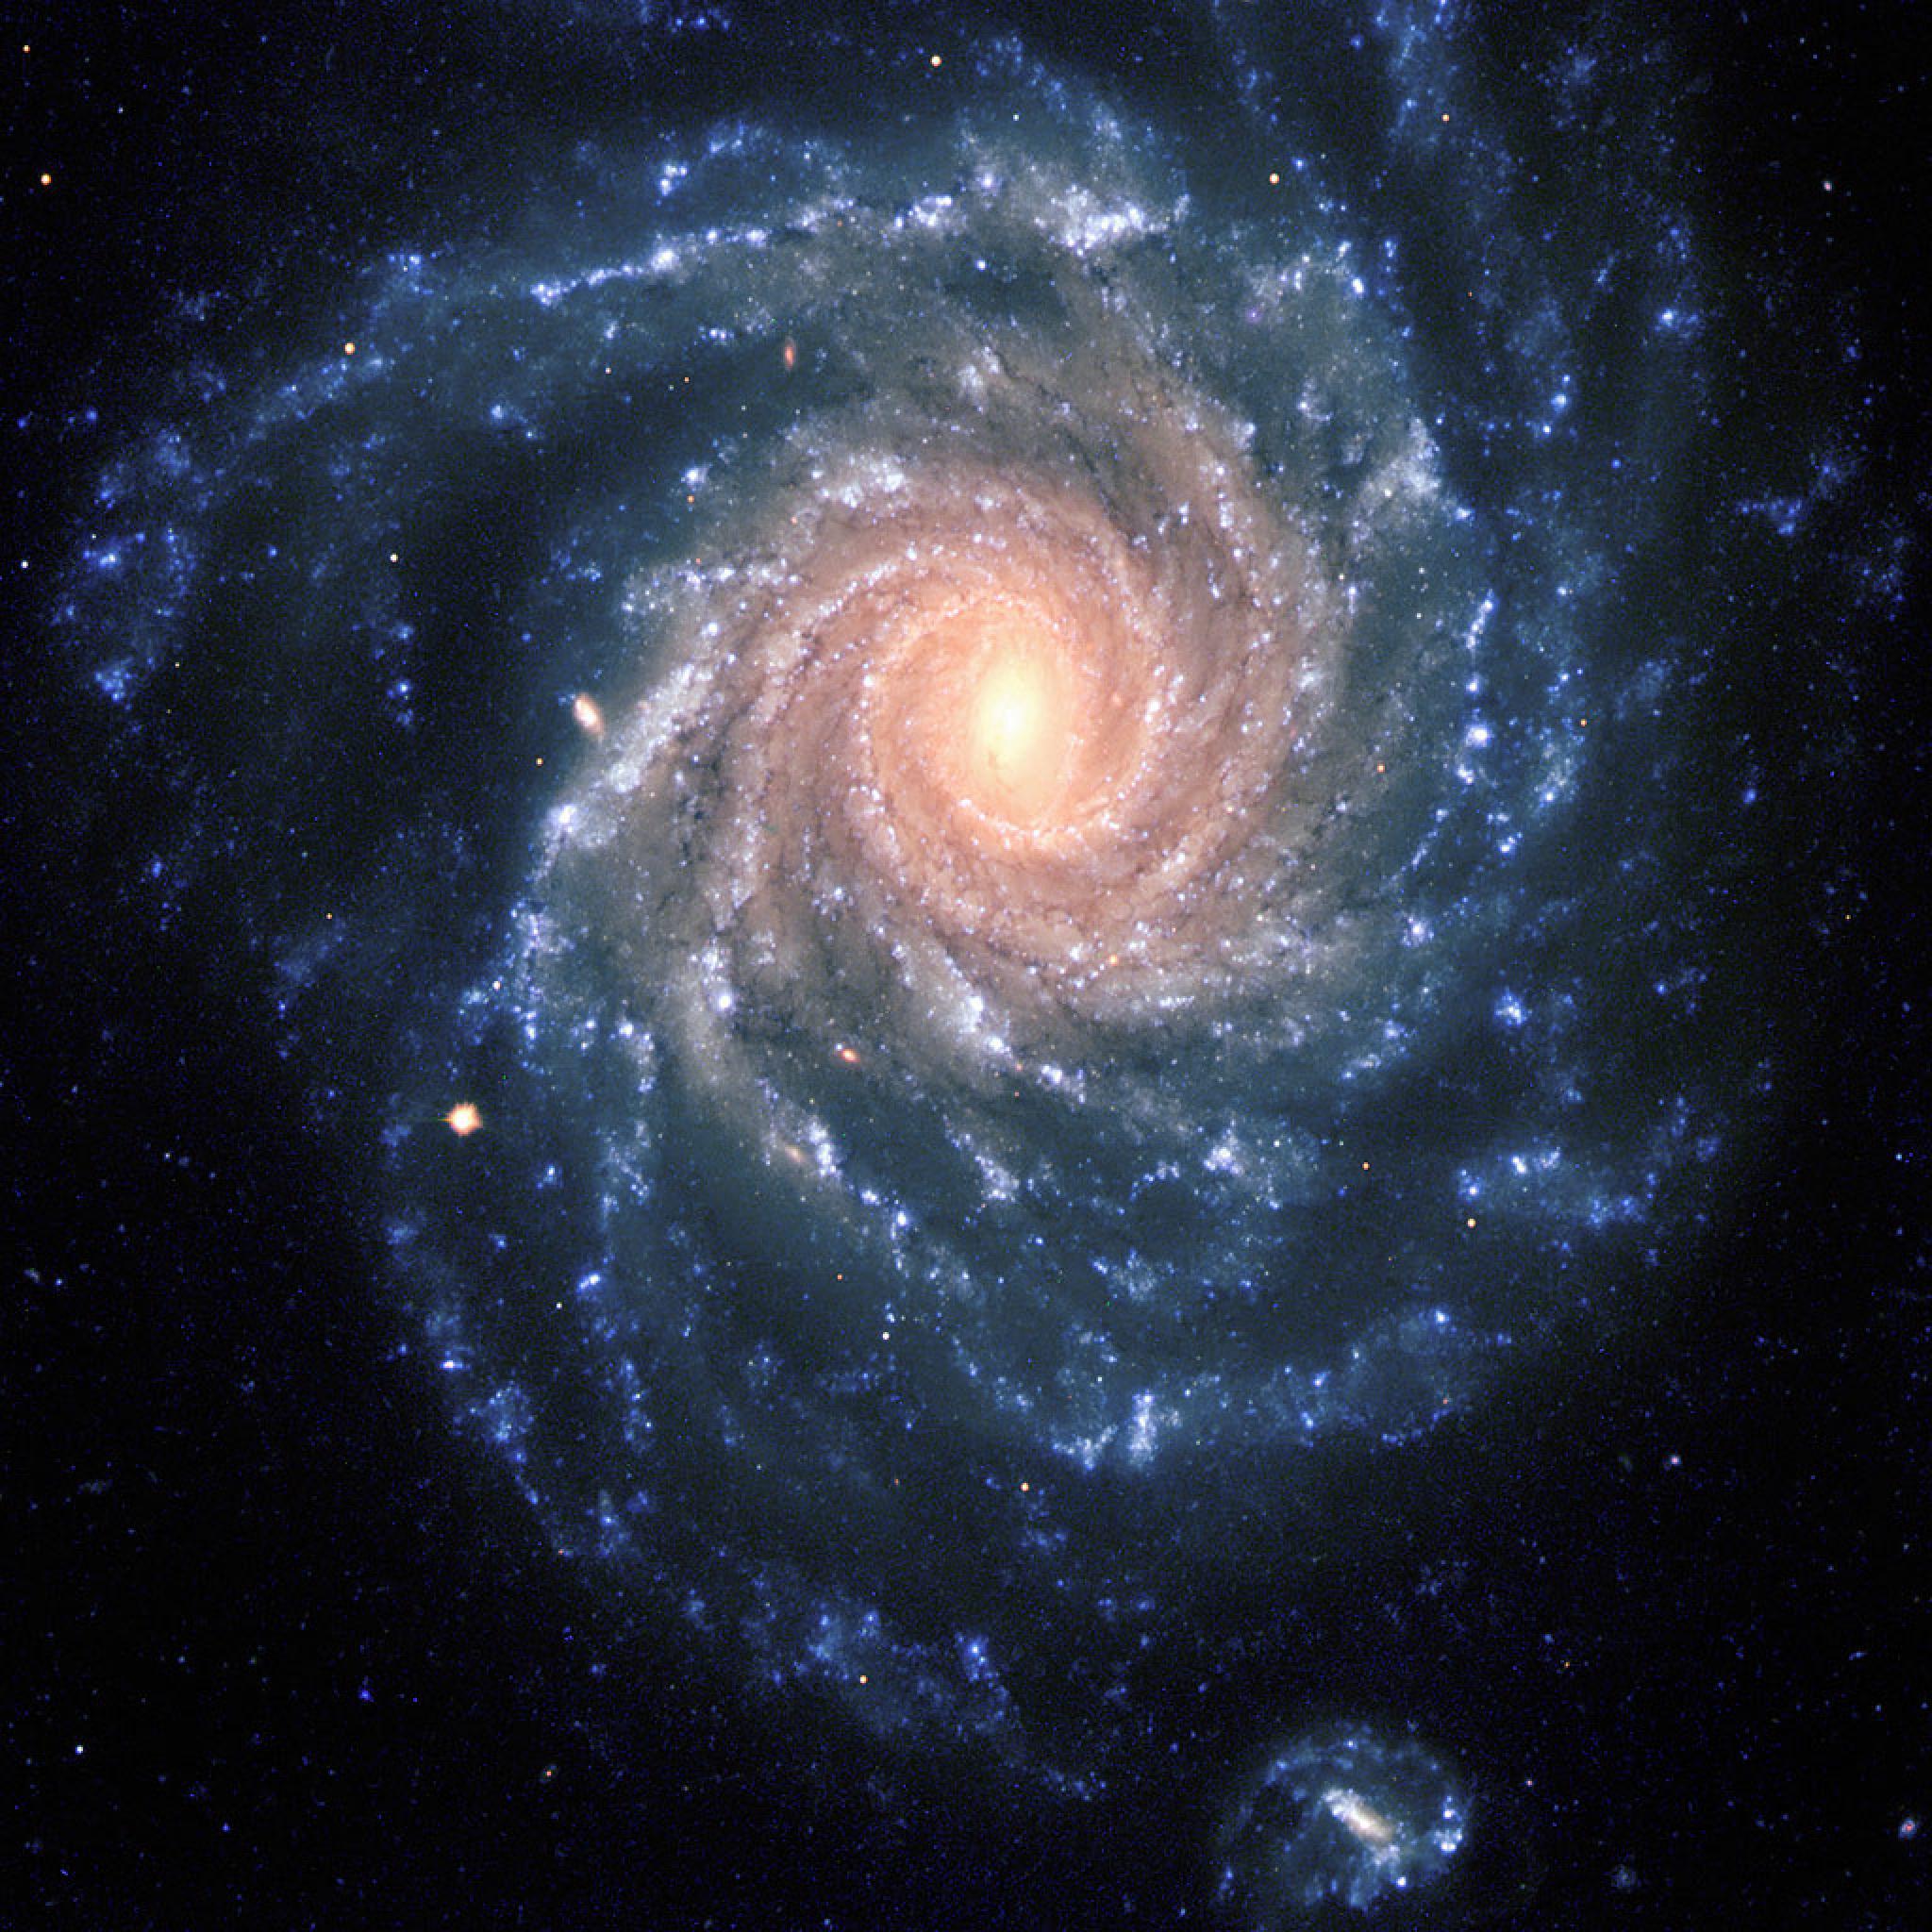 Galaxy Wallpaper 1080p: Spiral Galaxy Wallpaper Hd